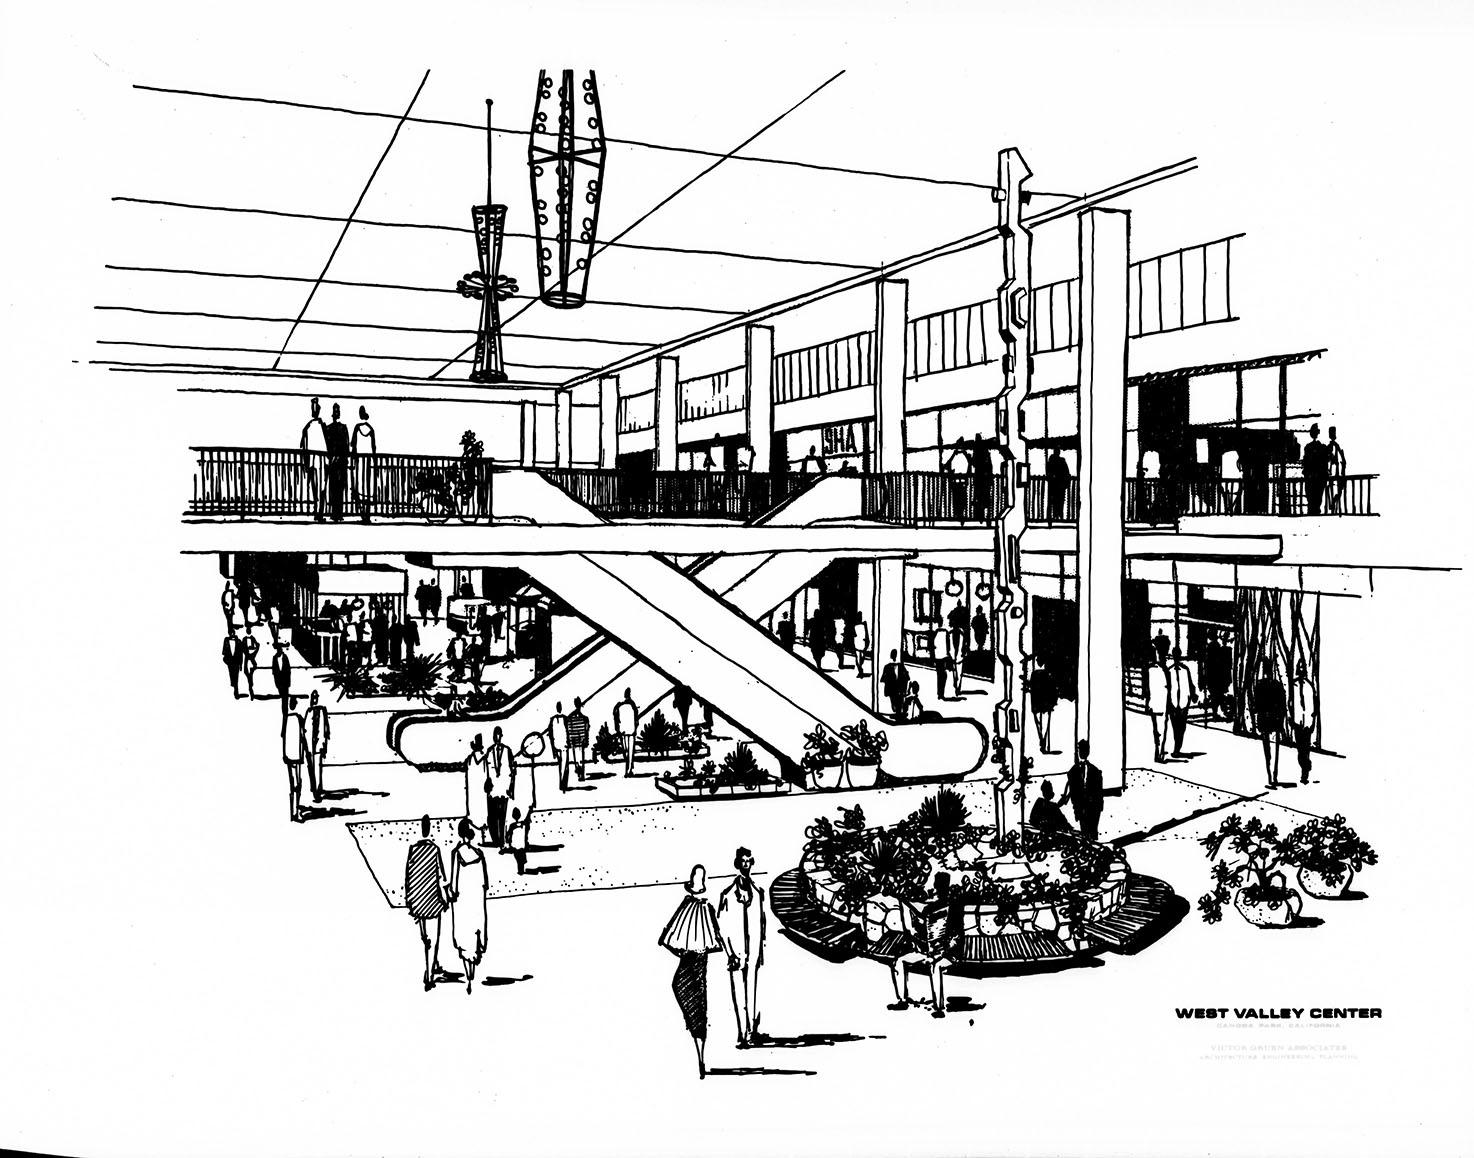 Topanga Plaza_West Valley Center Interior